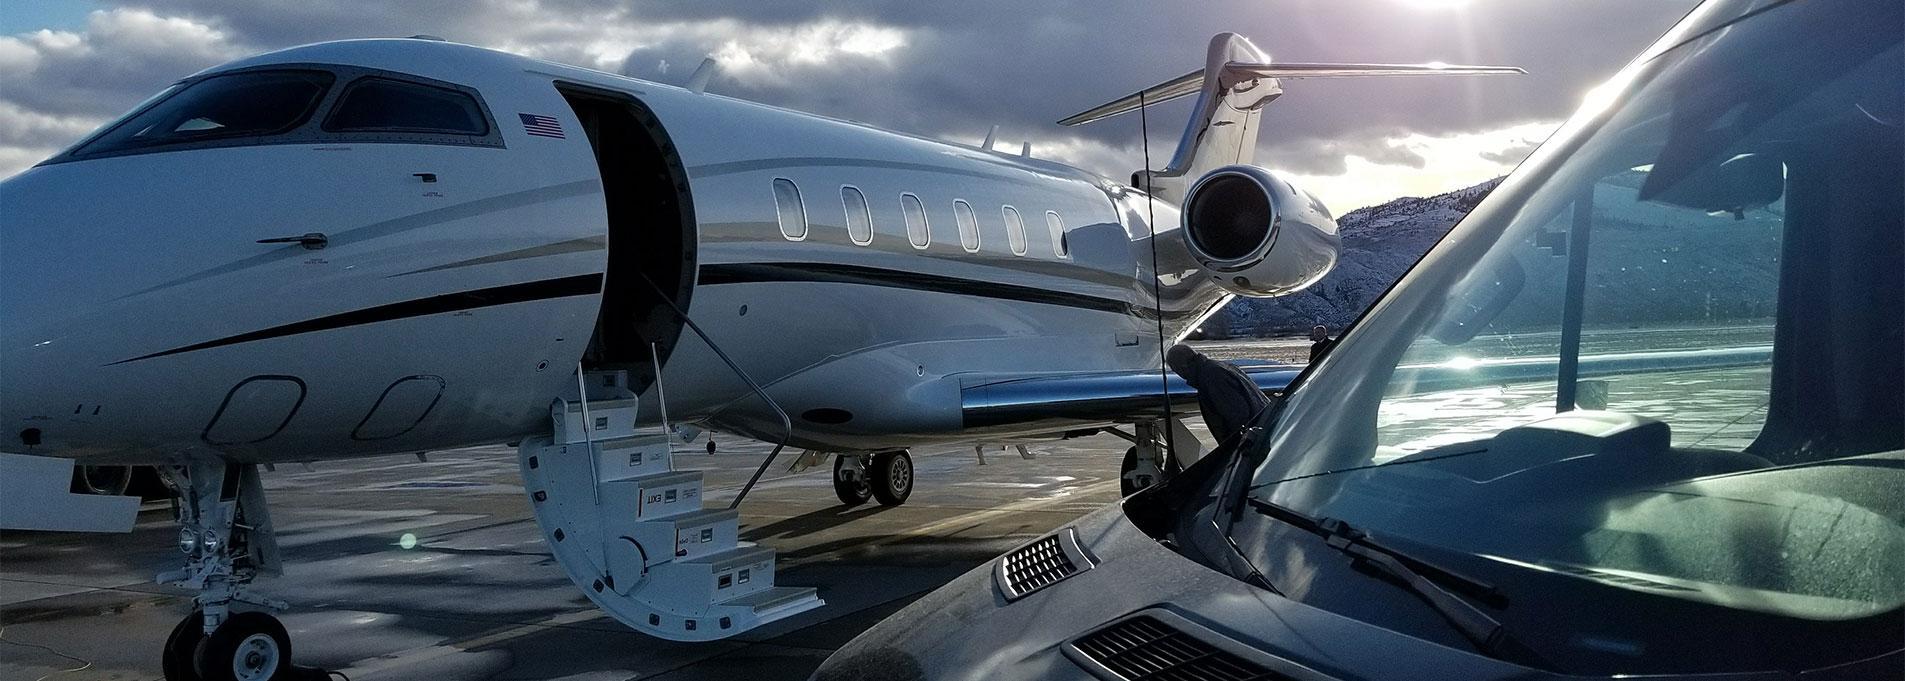 YKA Private Plane